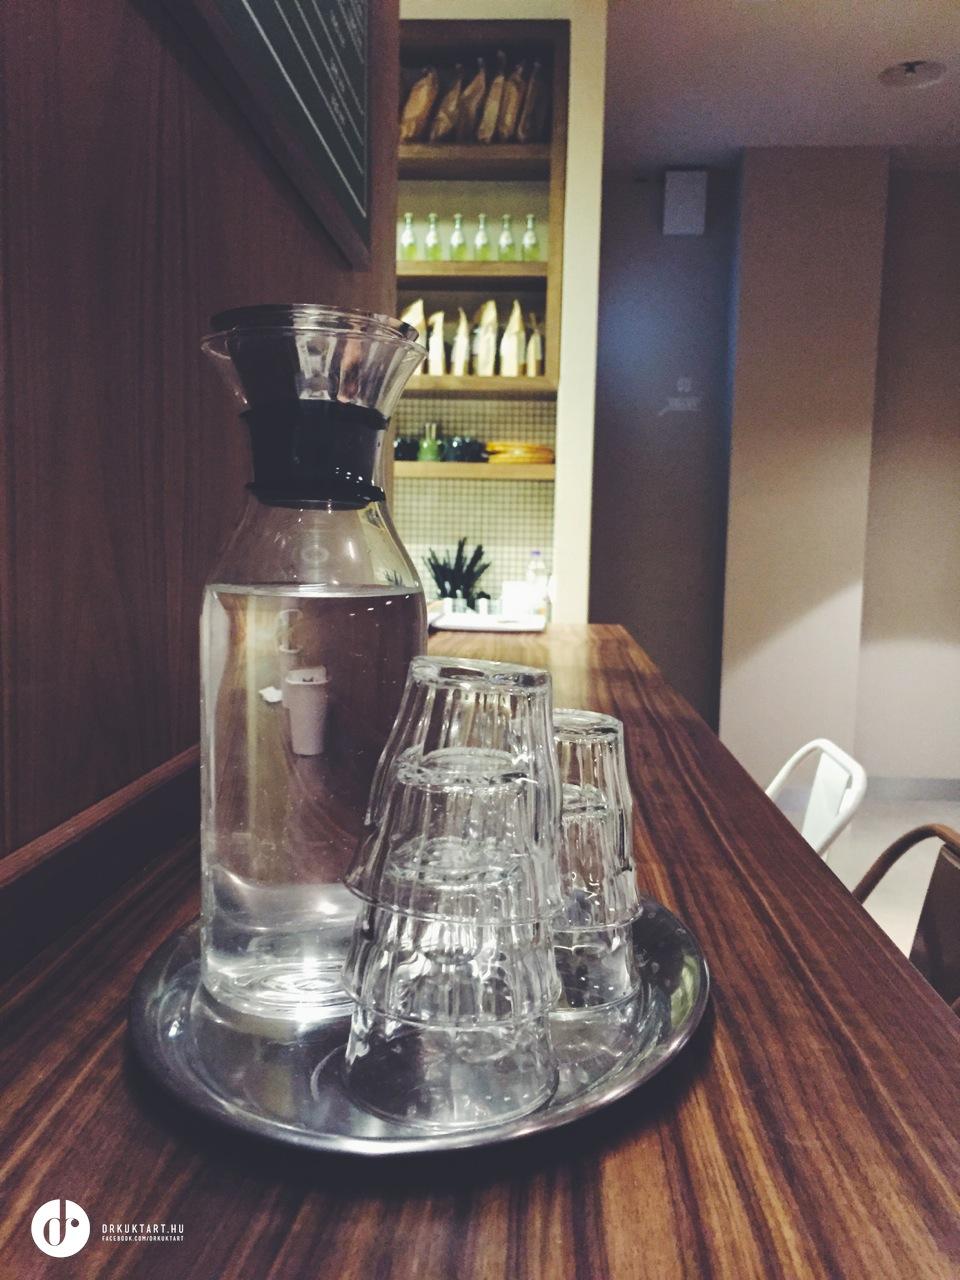 drkuktart_mygreencupbudapestcoffee09.jpg